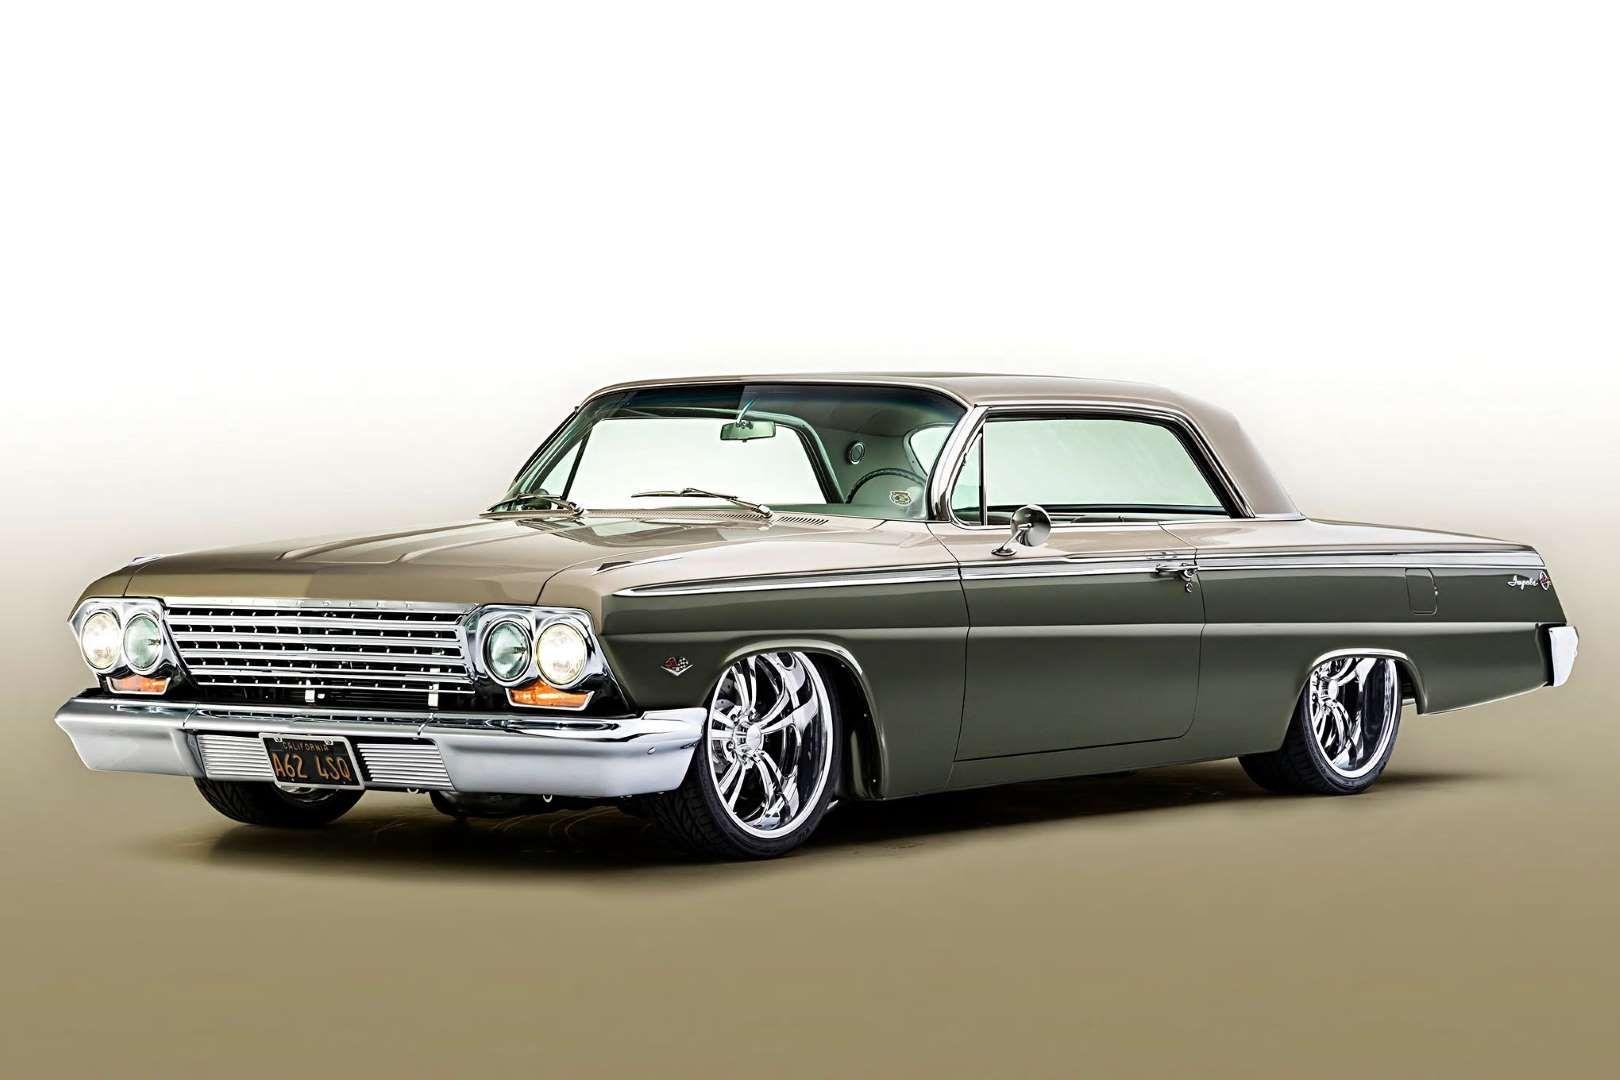 03 1962 Chevy Impala Lindberg Jpg Jorge Nunez Chevrolet Impala